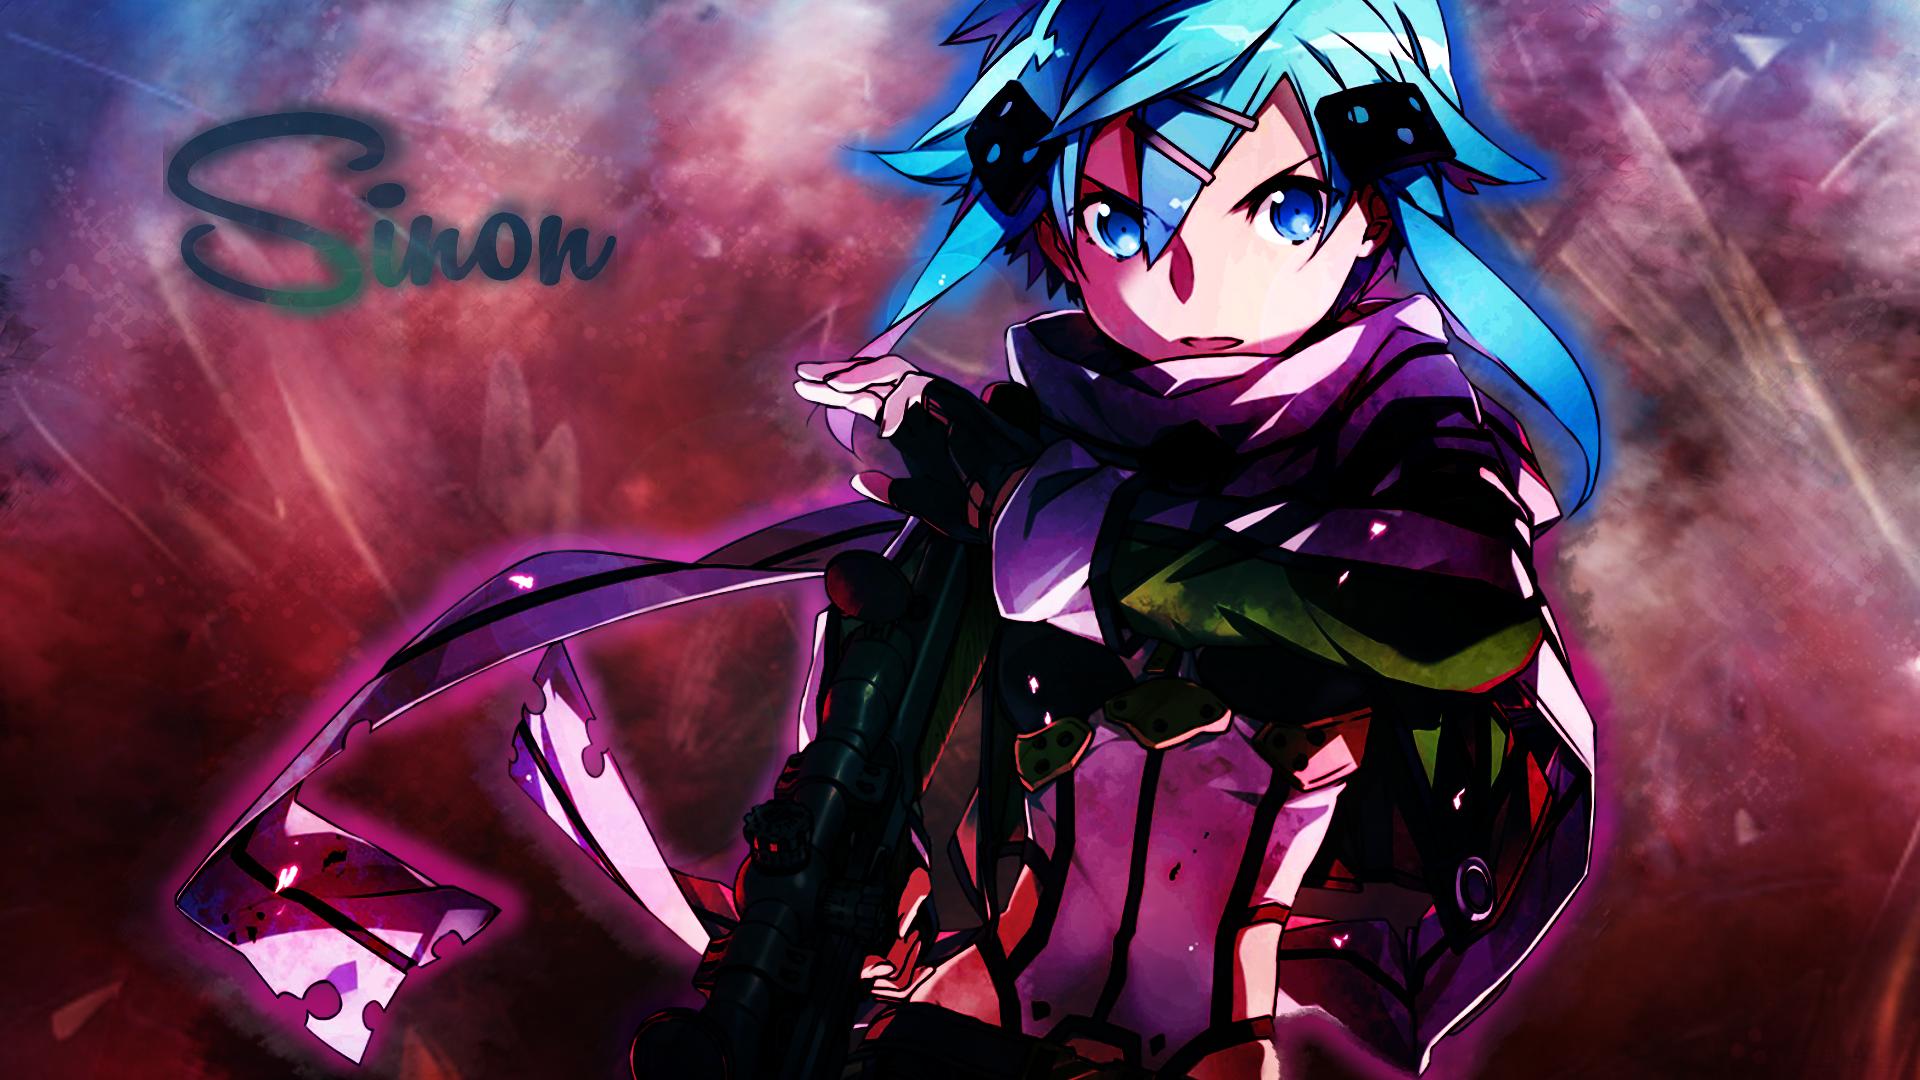 Download 1920x1080 Wallpaper Sword Art Online Sinon Anime Full Hd